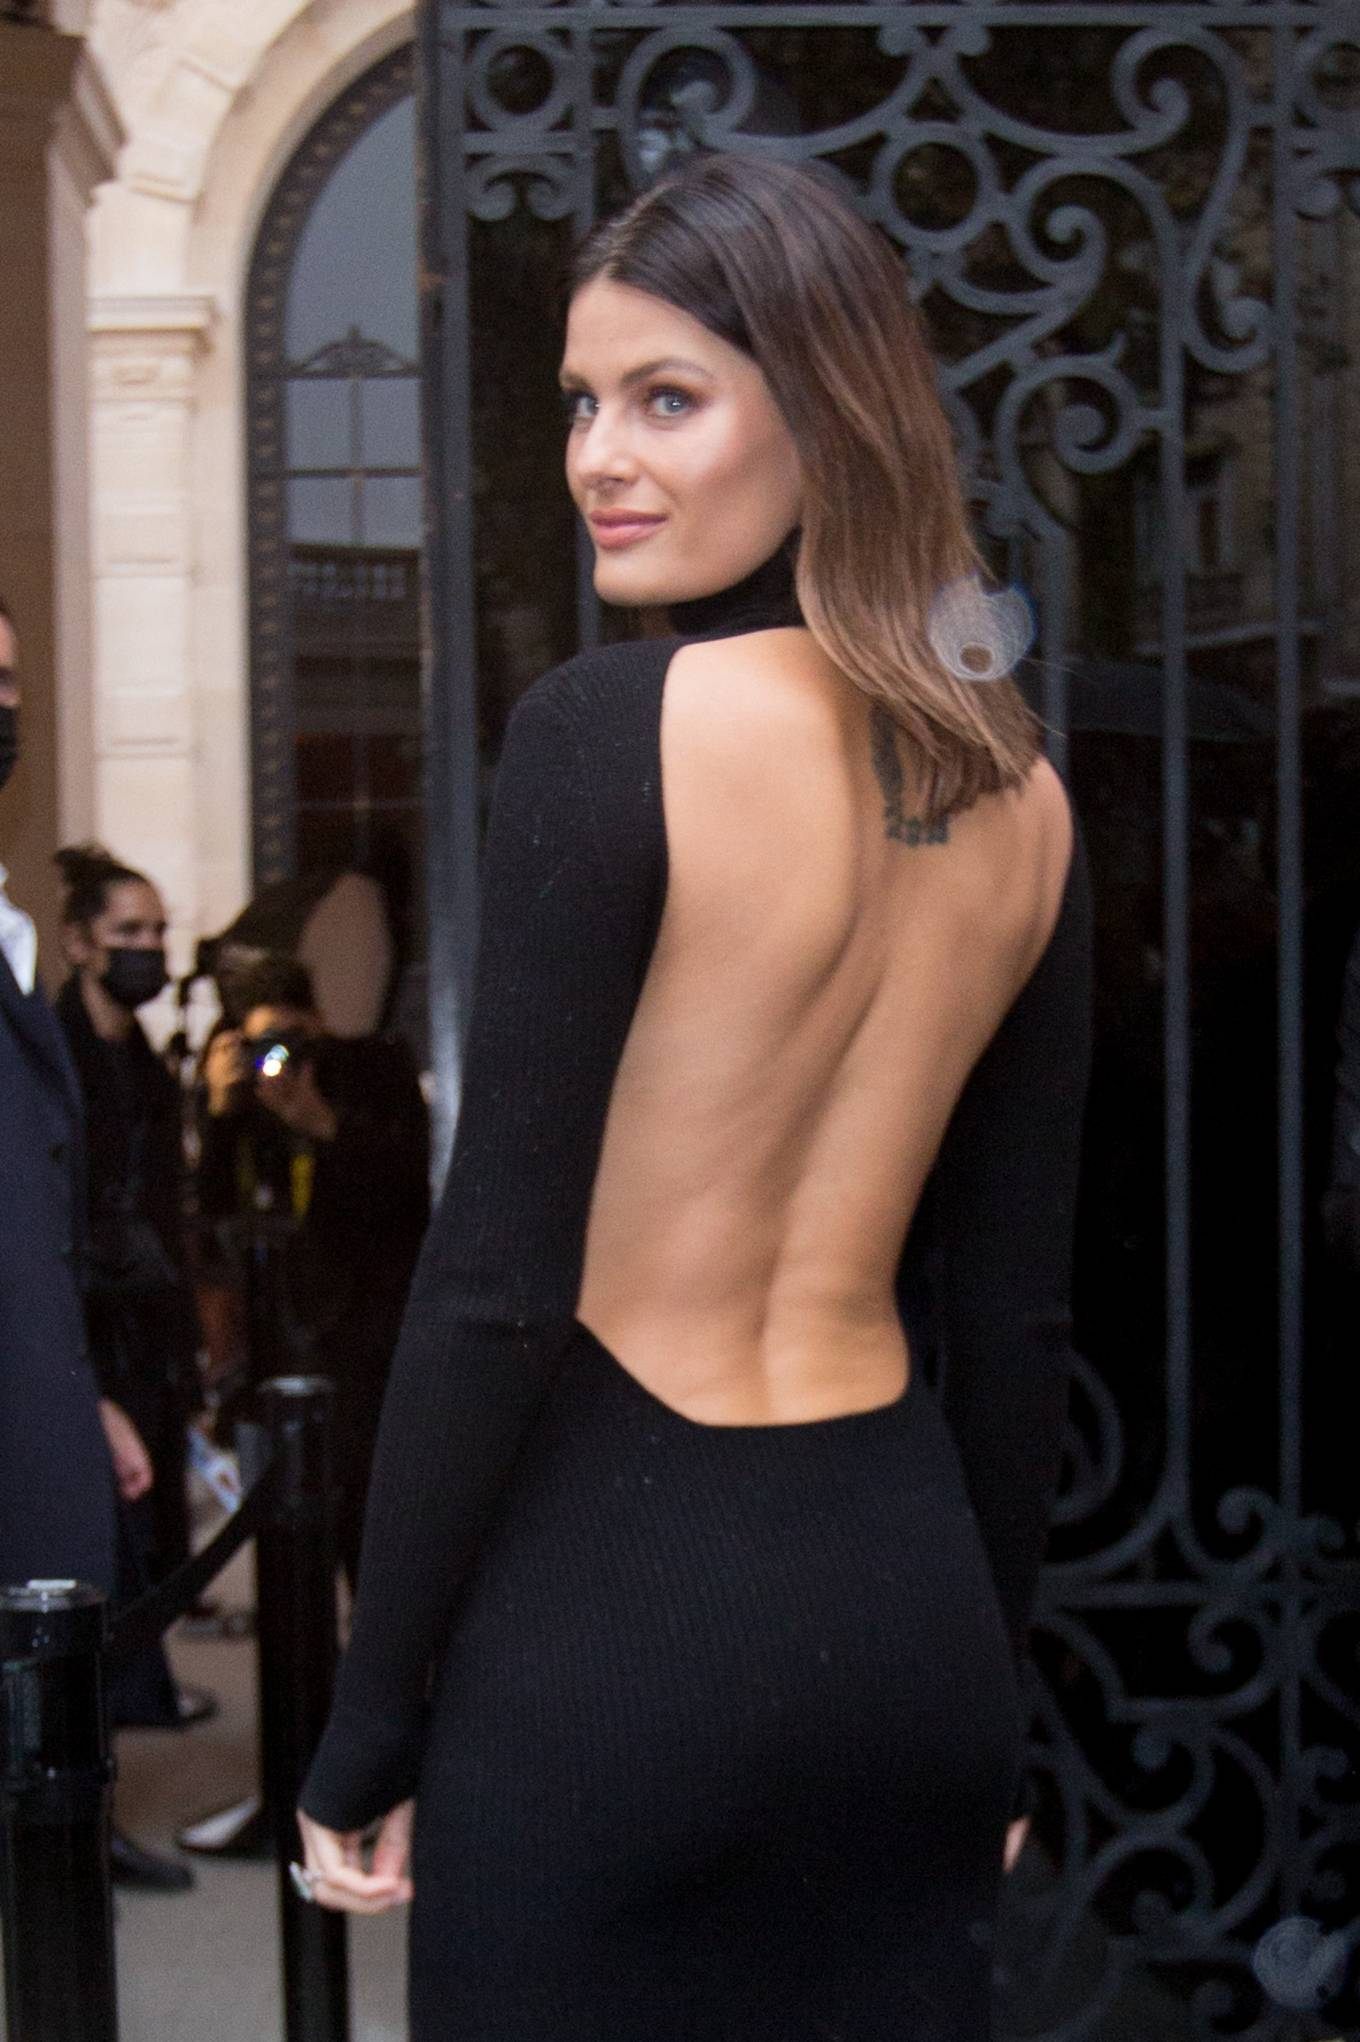 Isabeli Fontana - Attends the 'Vogue' Paris celebrating its 100th Anniversary